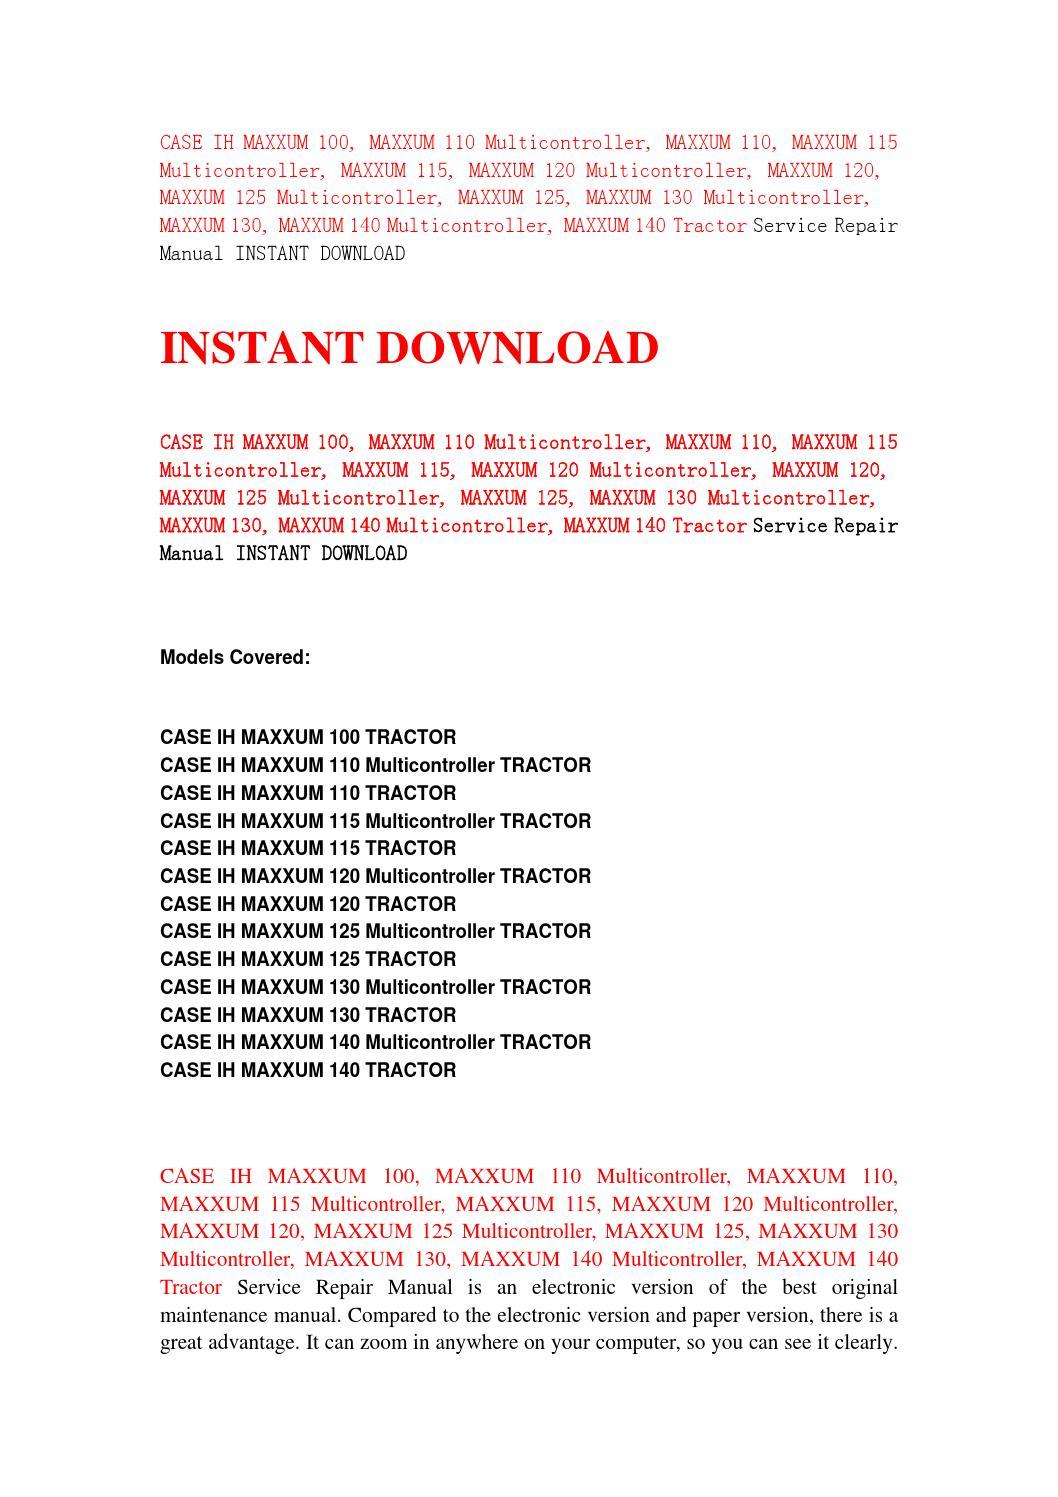 case ih maxxum 125 service manual